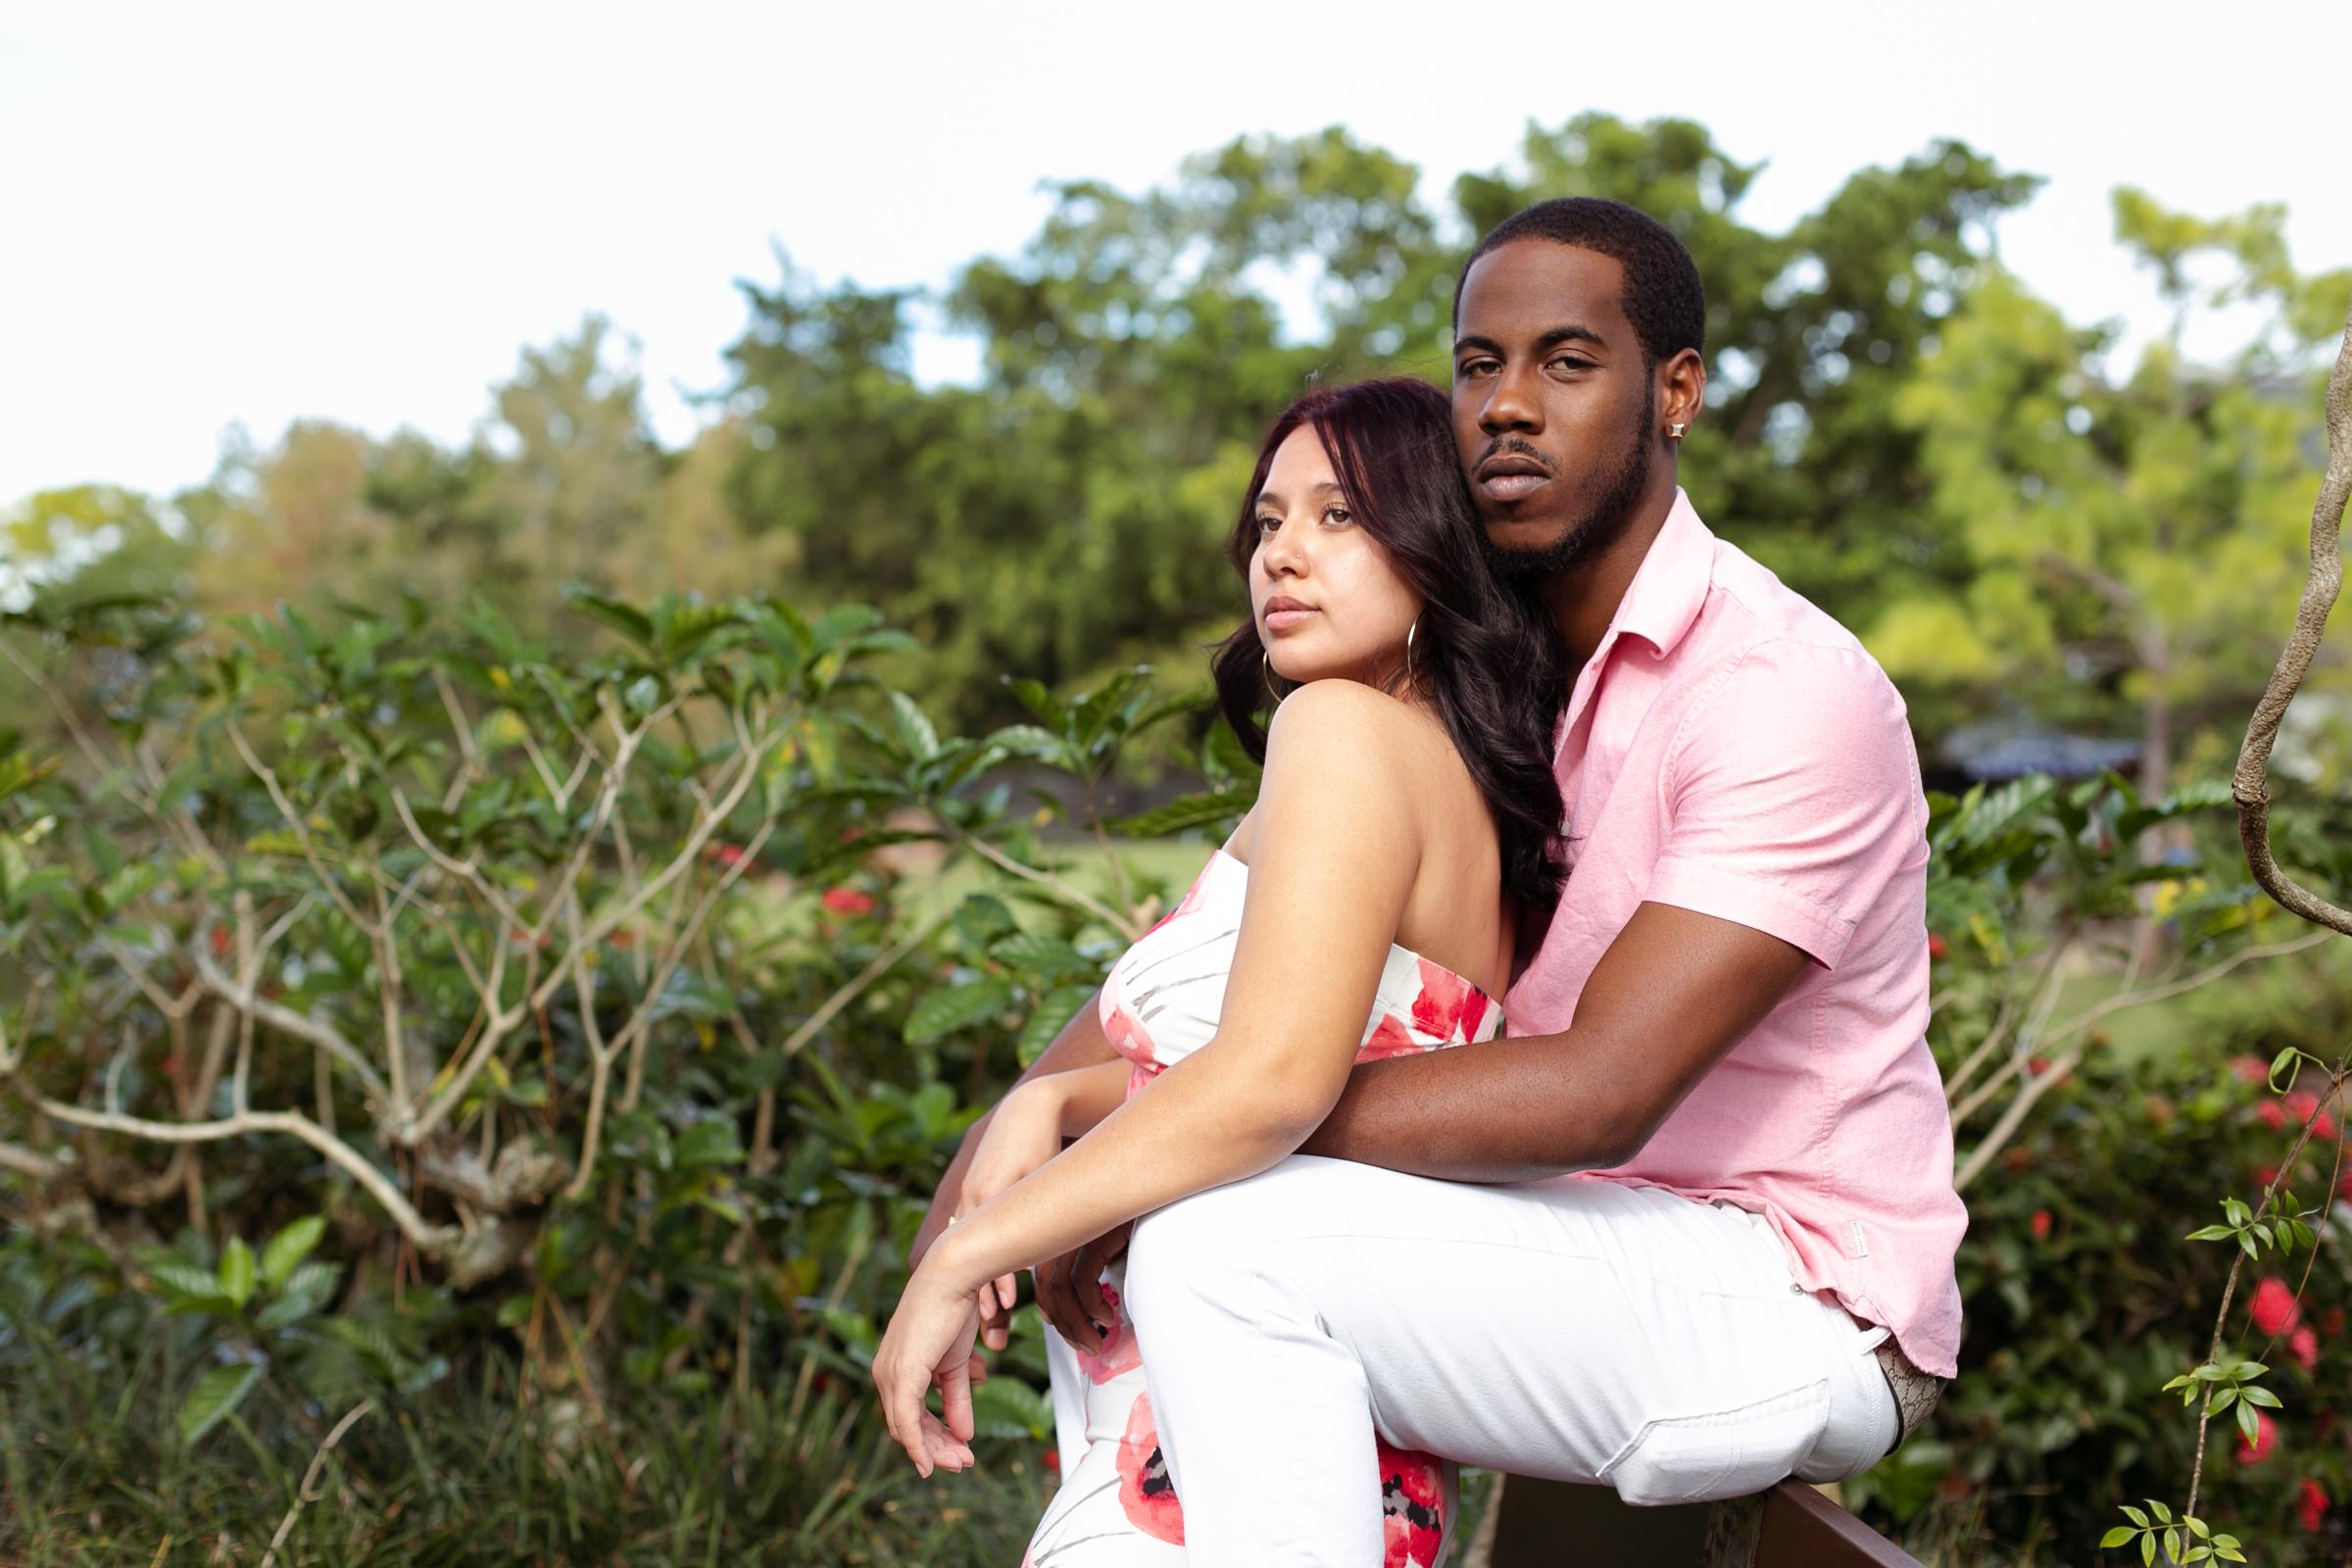 Frank & Marina-7.jpg